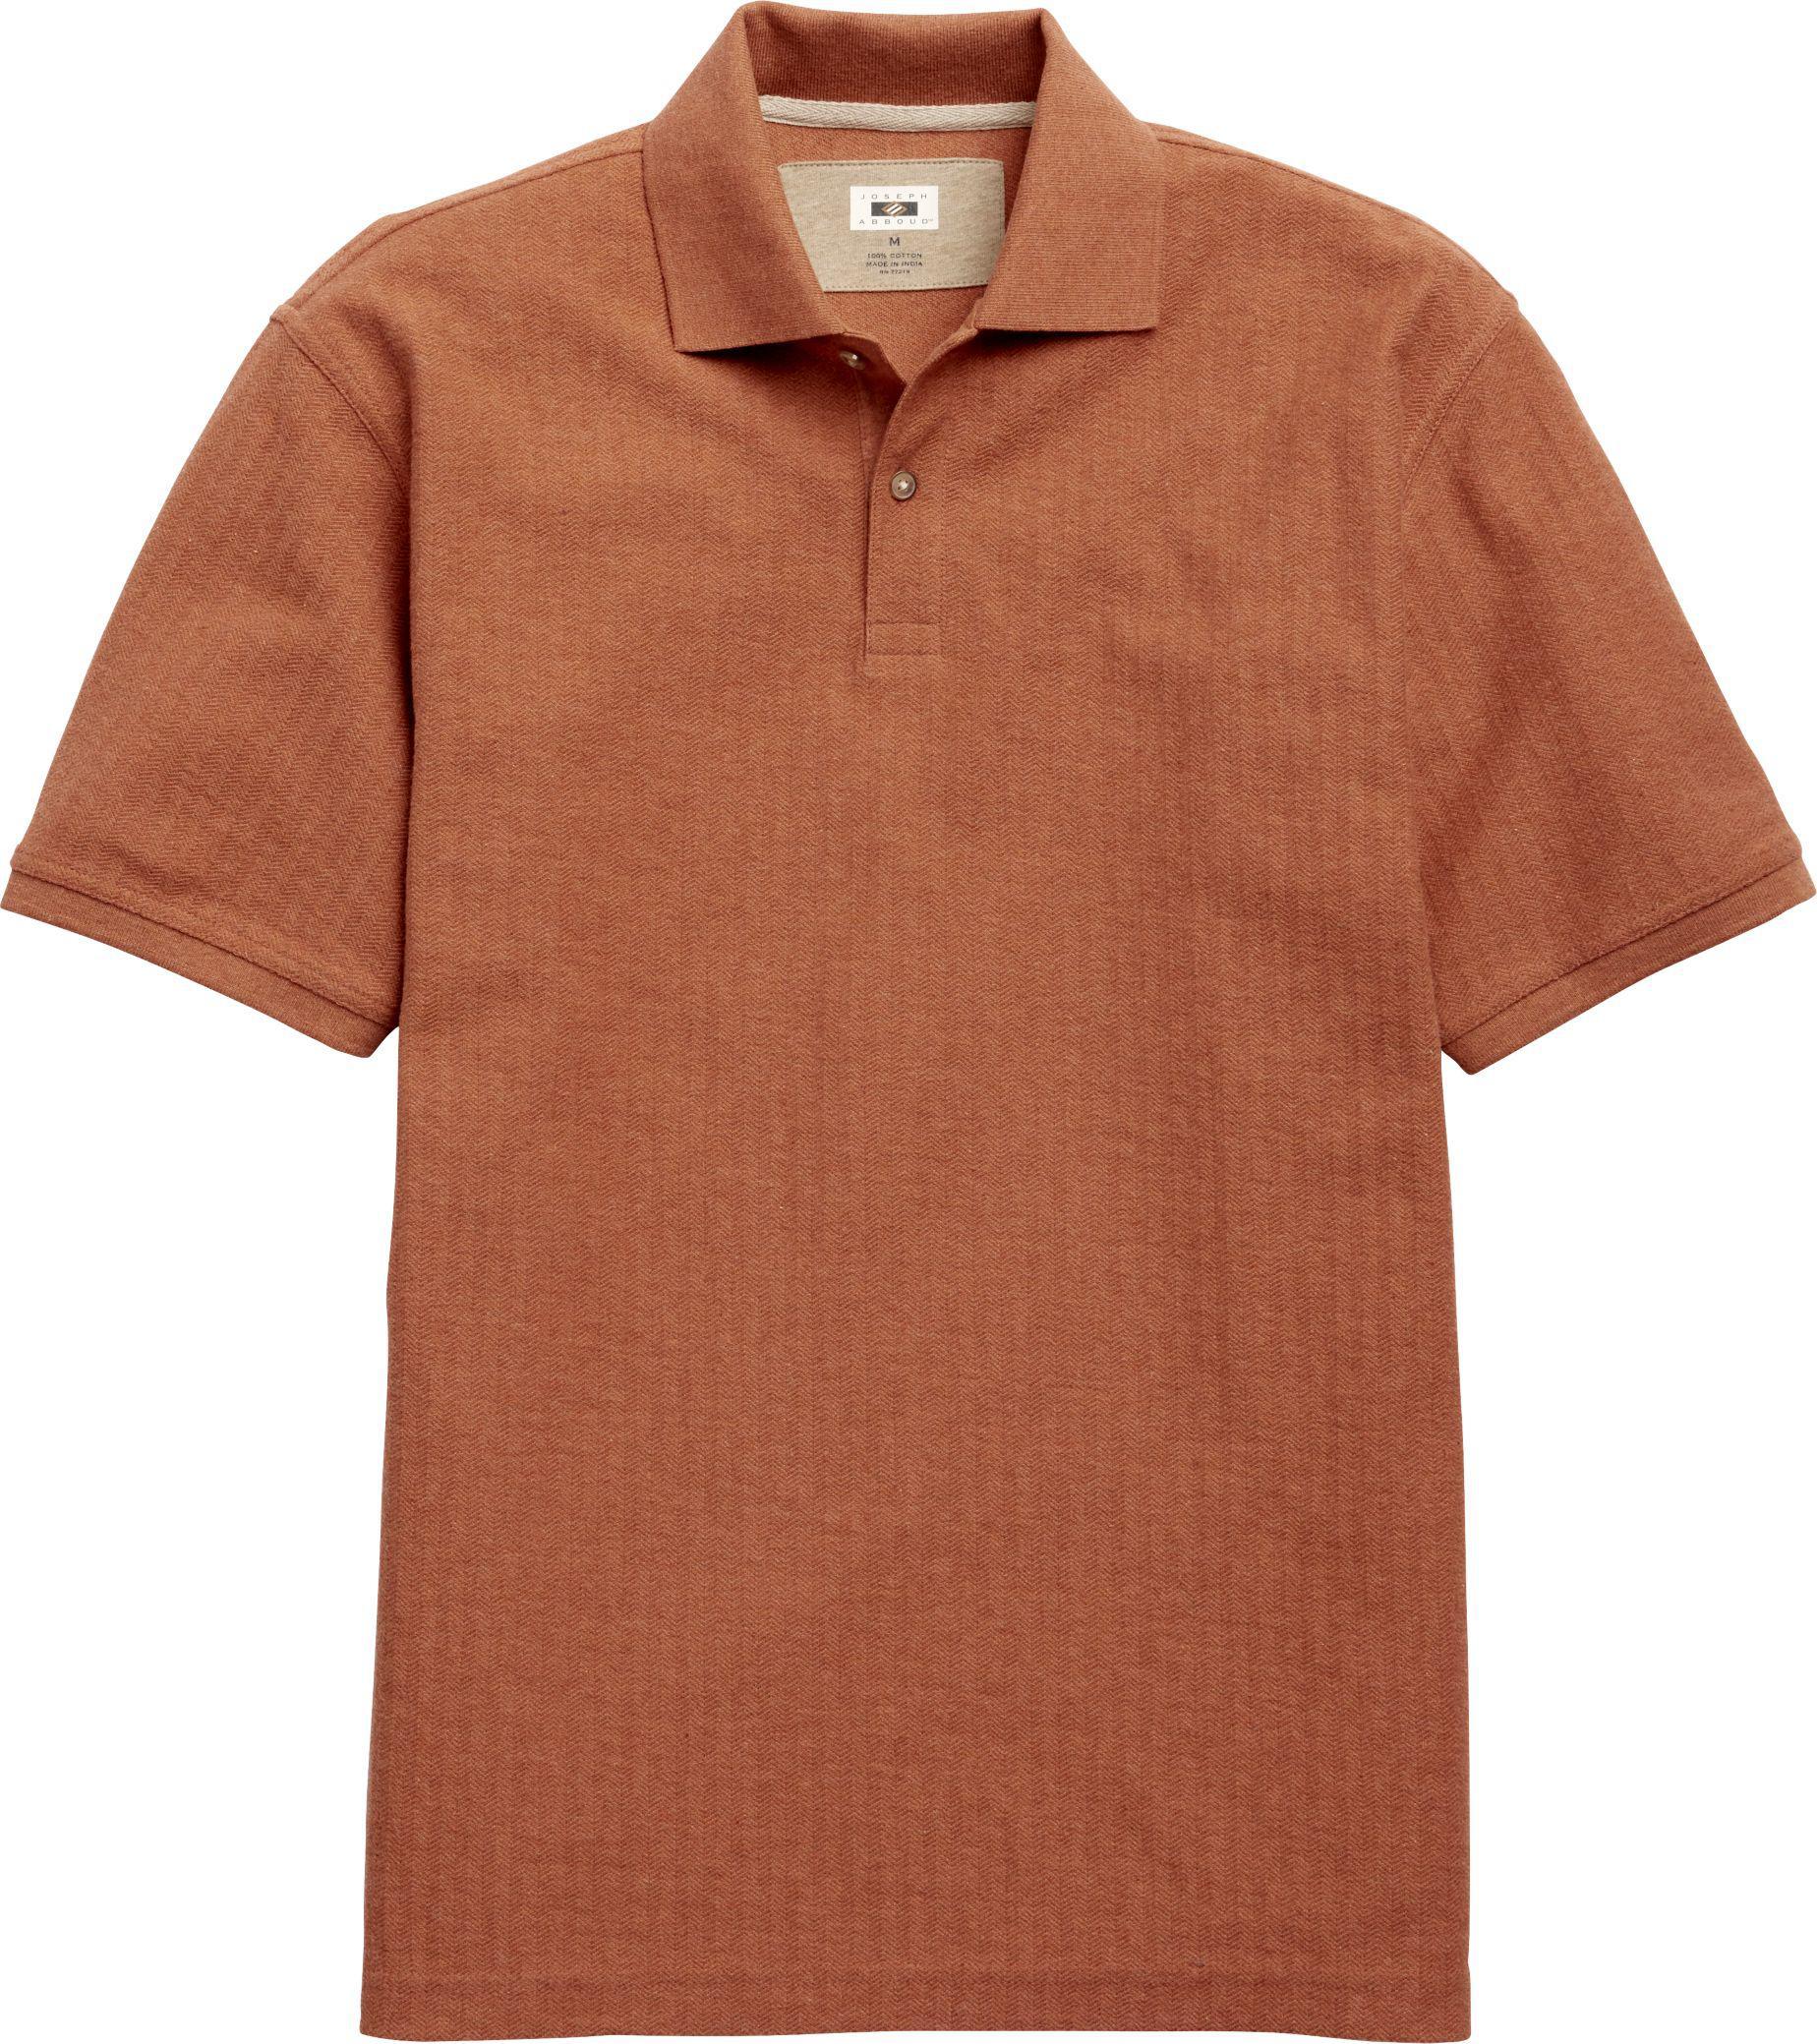 cf124b90f18 Joseph Abboud Mens Short Sleeve Polo Shirt